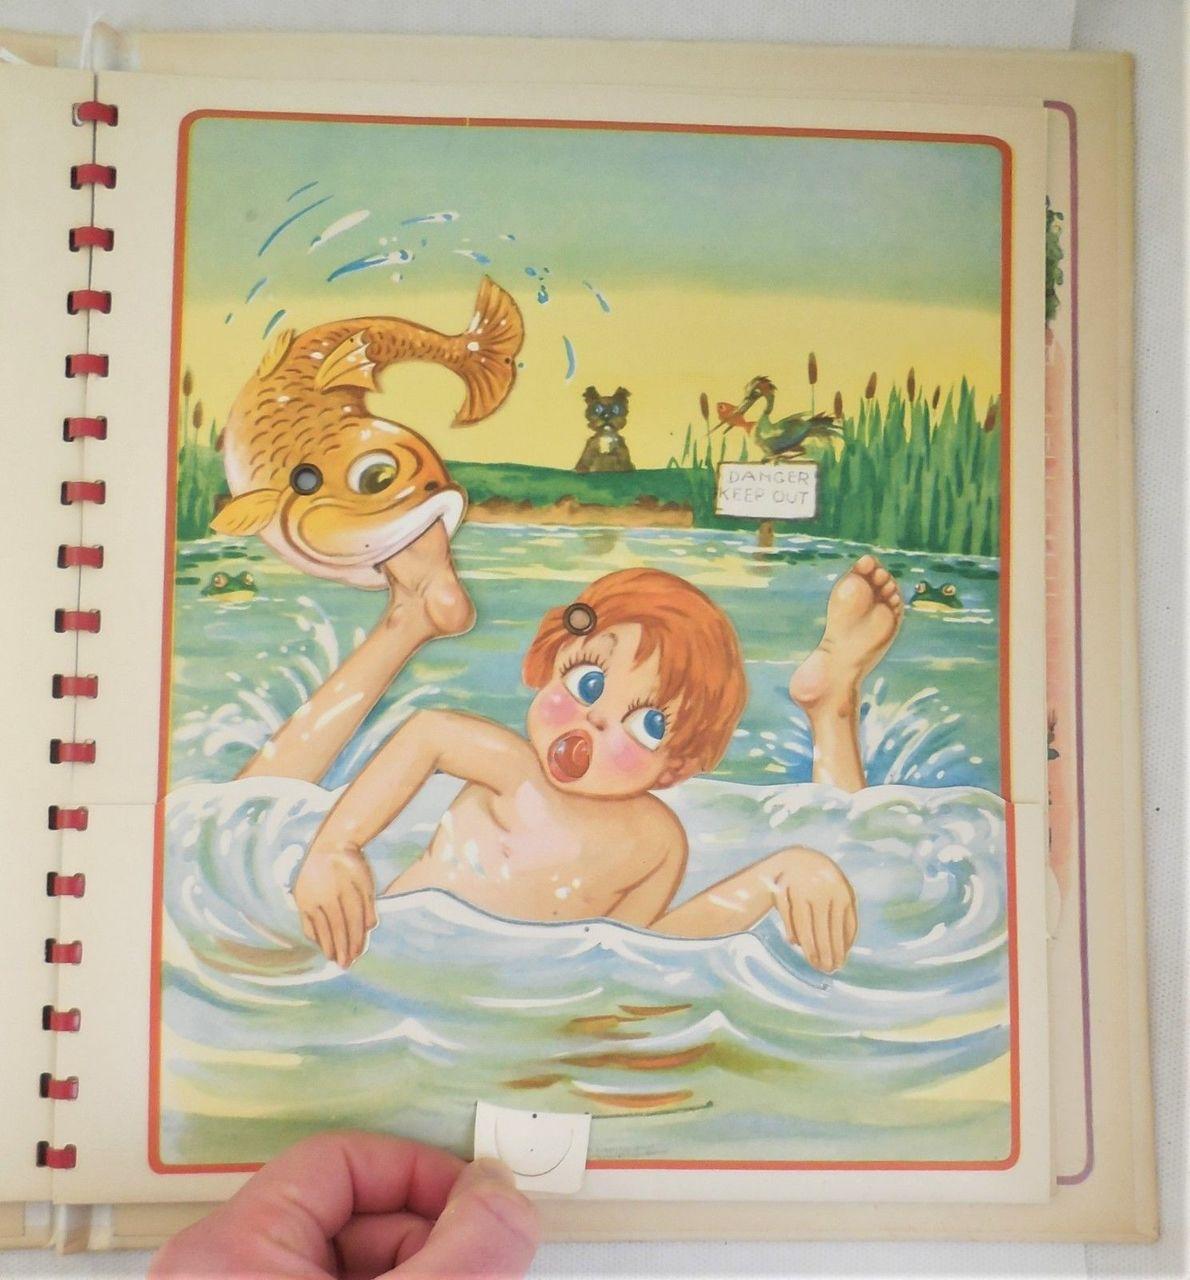 BUD AND SUE: THE BAREFOOT KIDS, Hank Hart - 1946